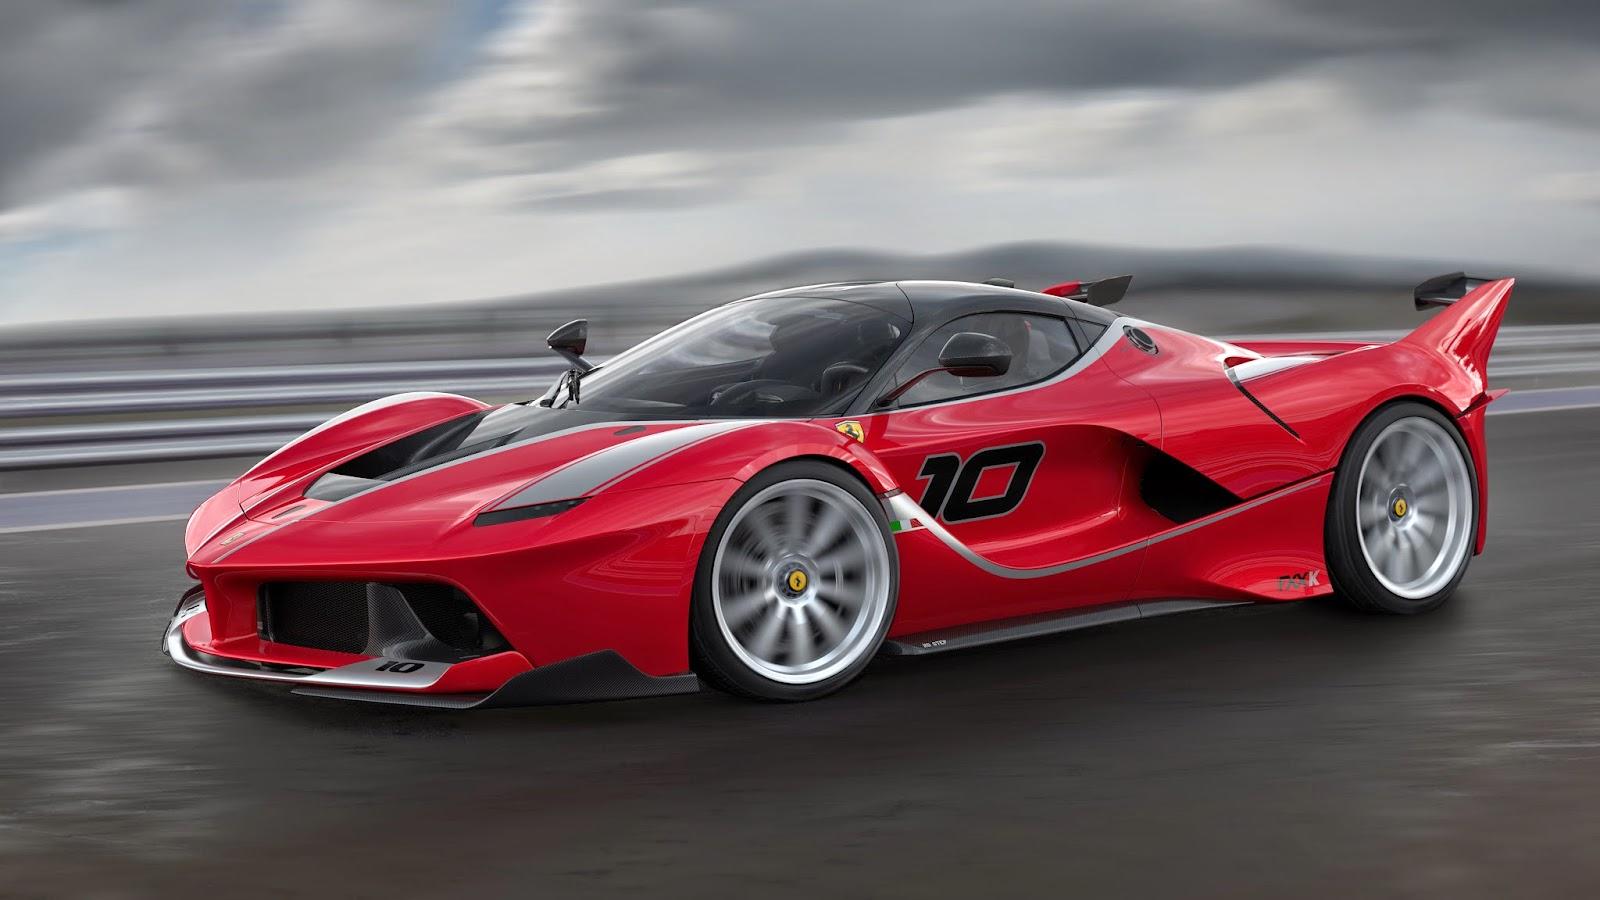 Ferrari Fxx K Sketch 3 Motoroids Com